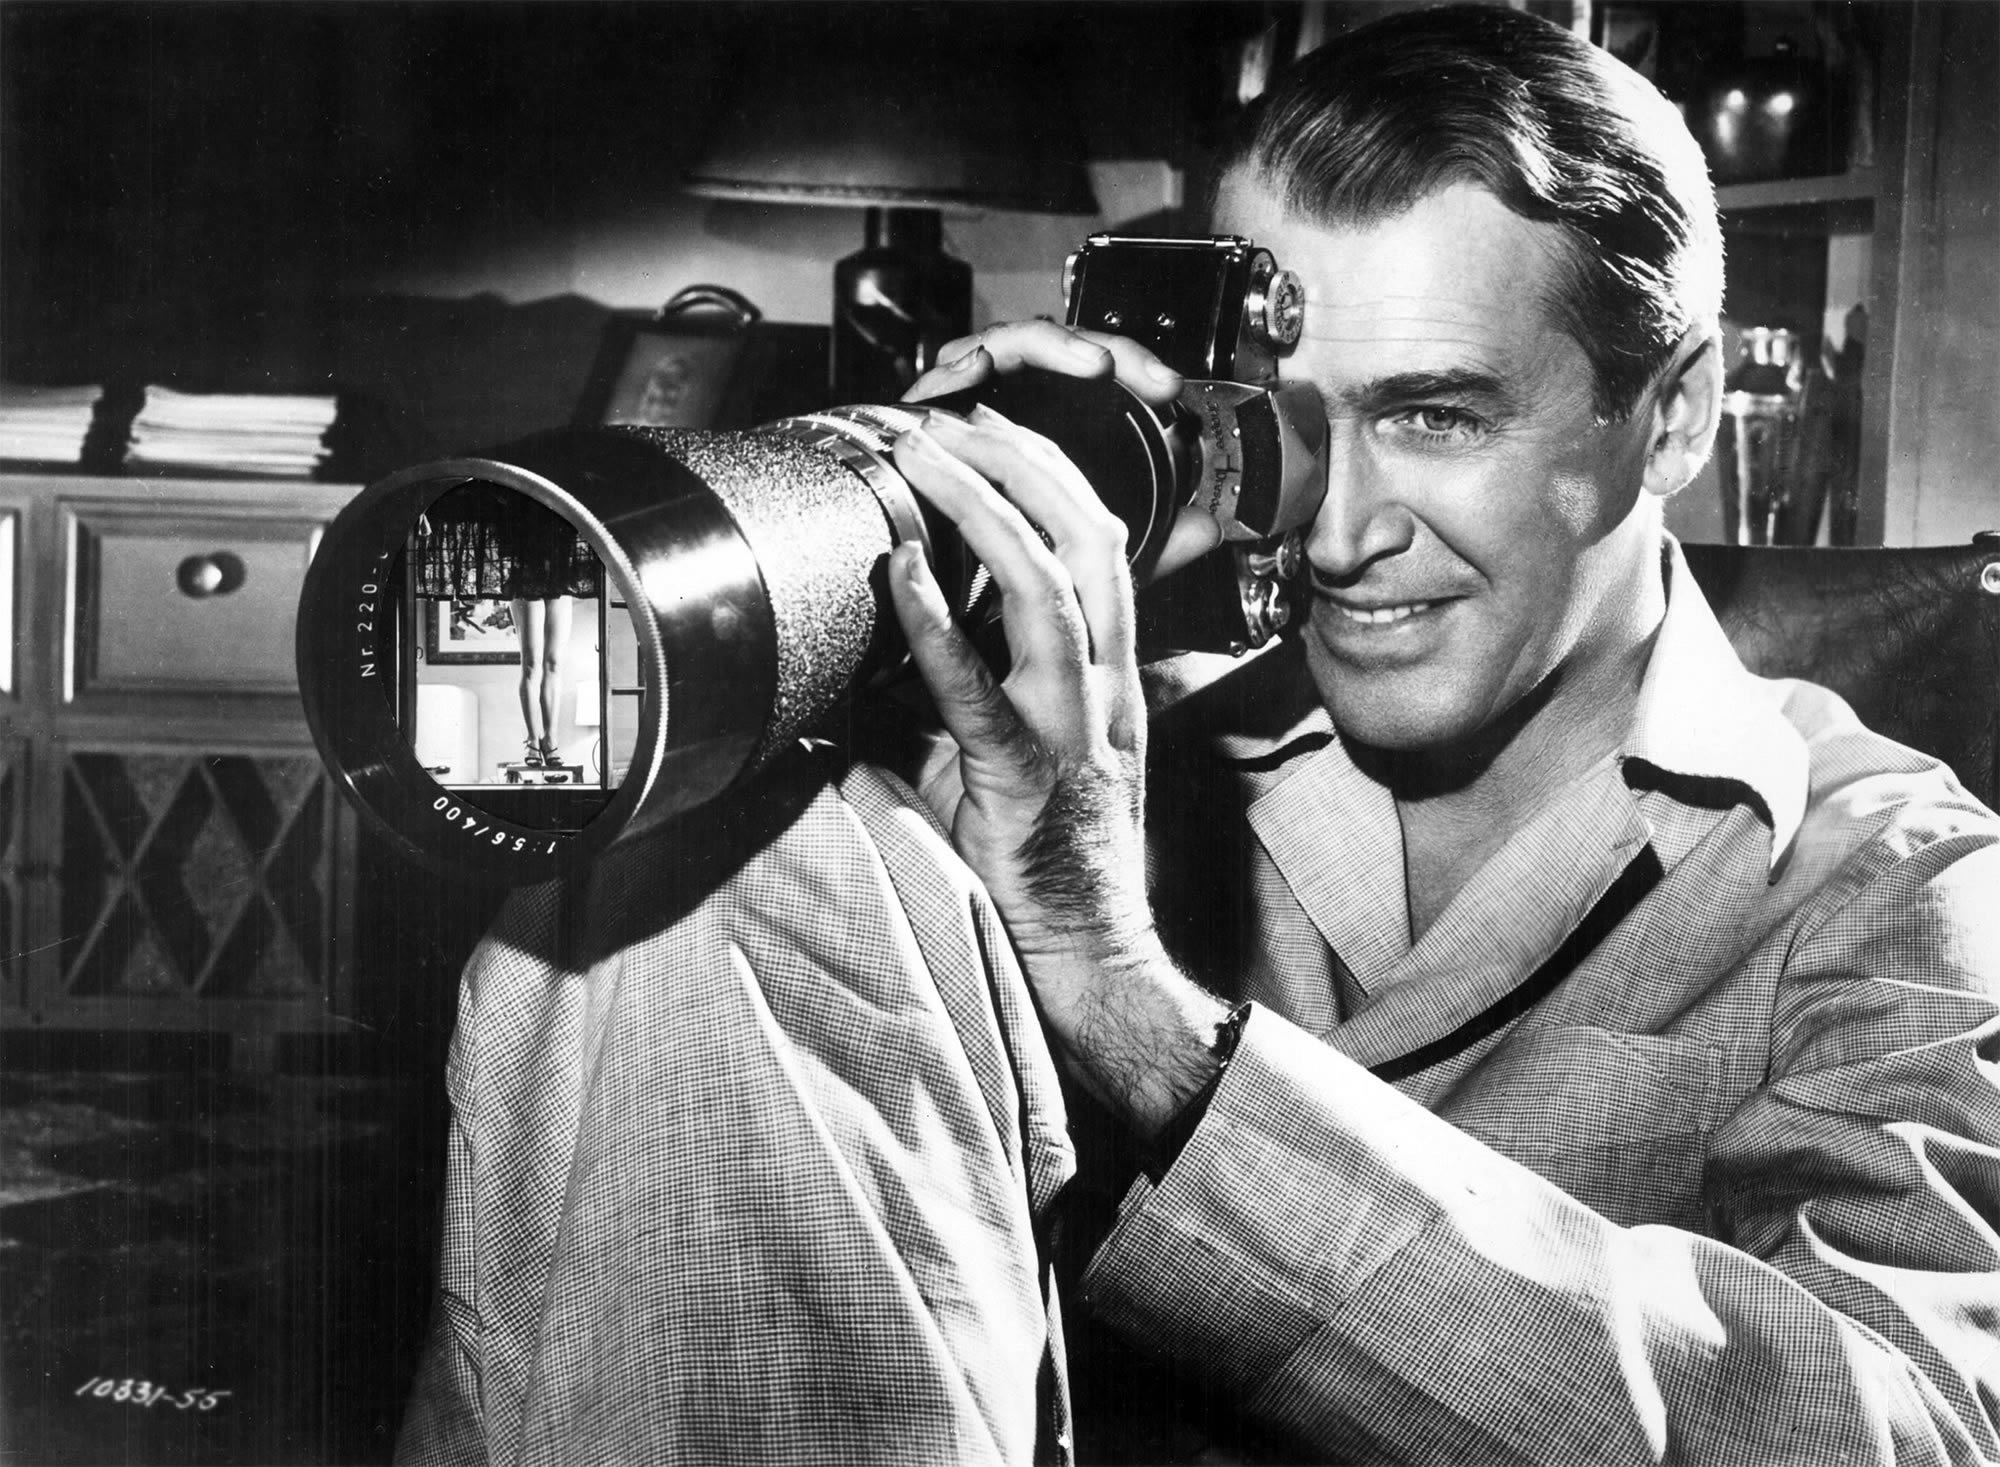 Rear Window, 1954. large lens camera, stalking